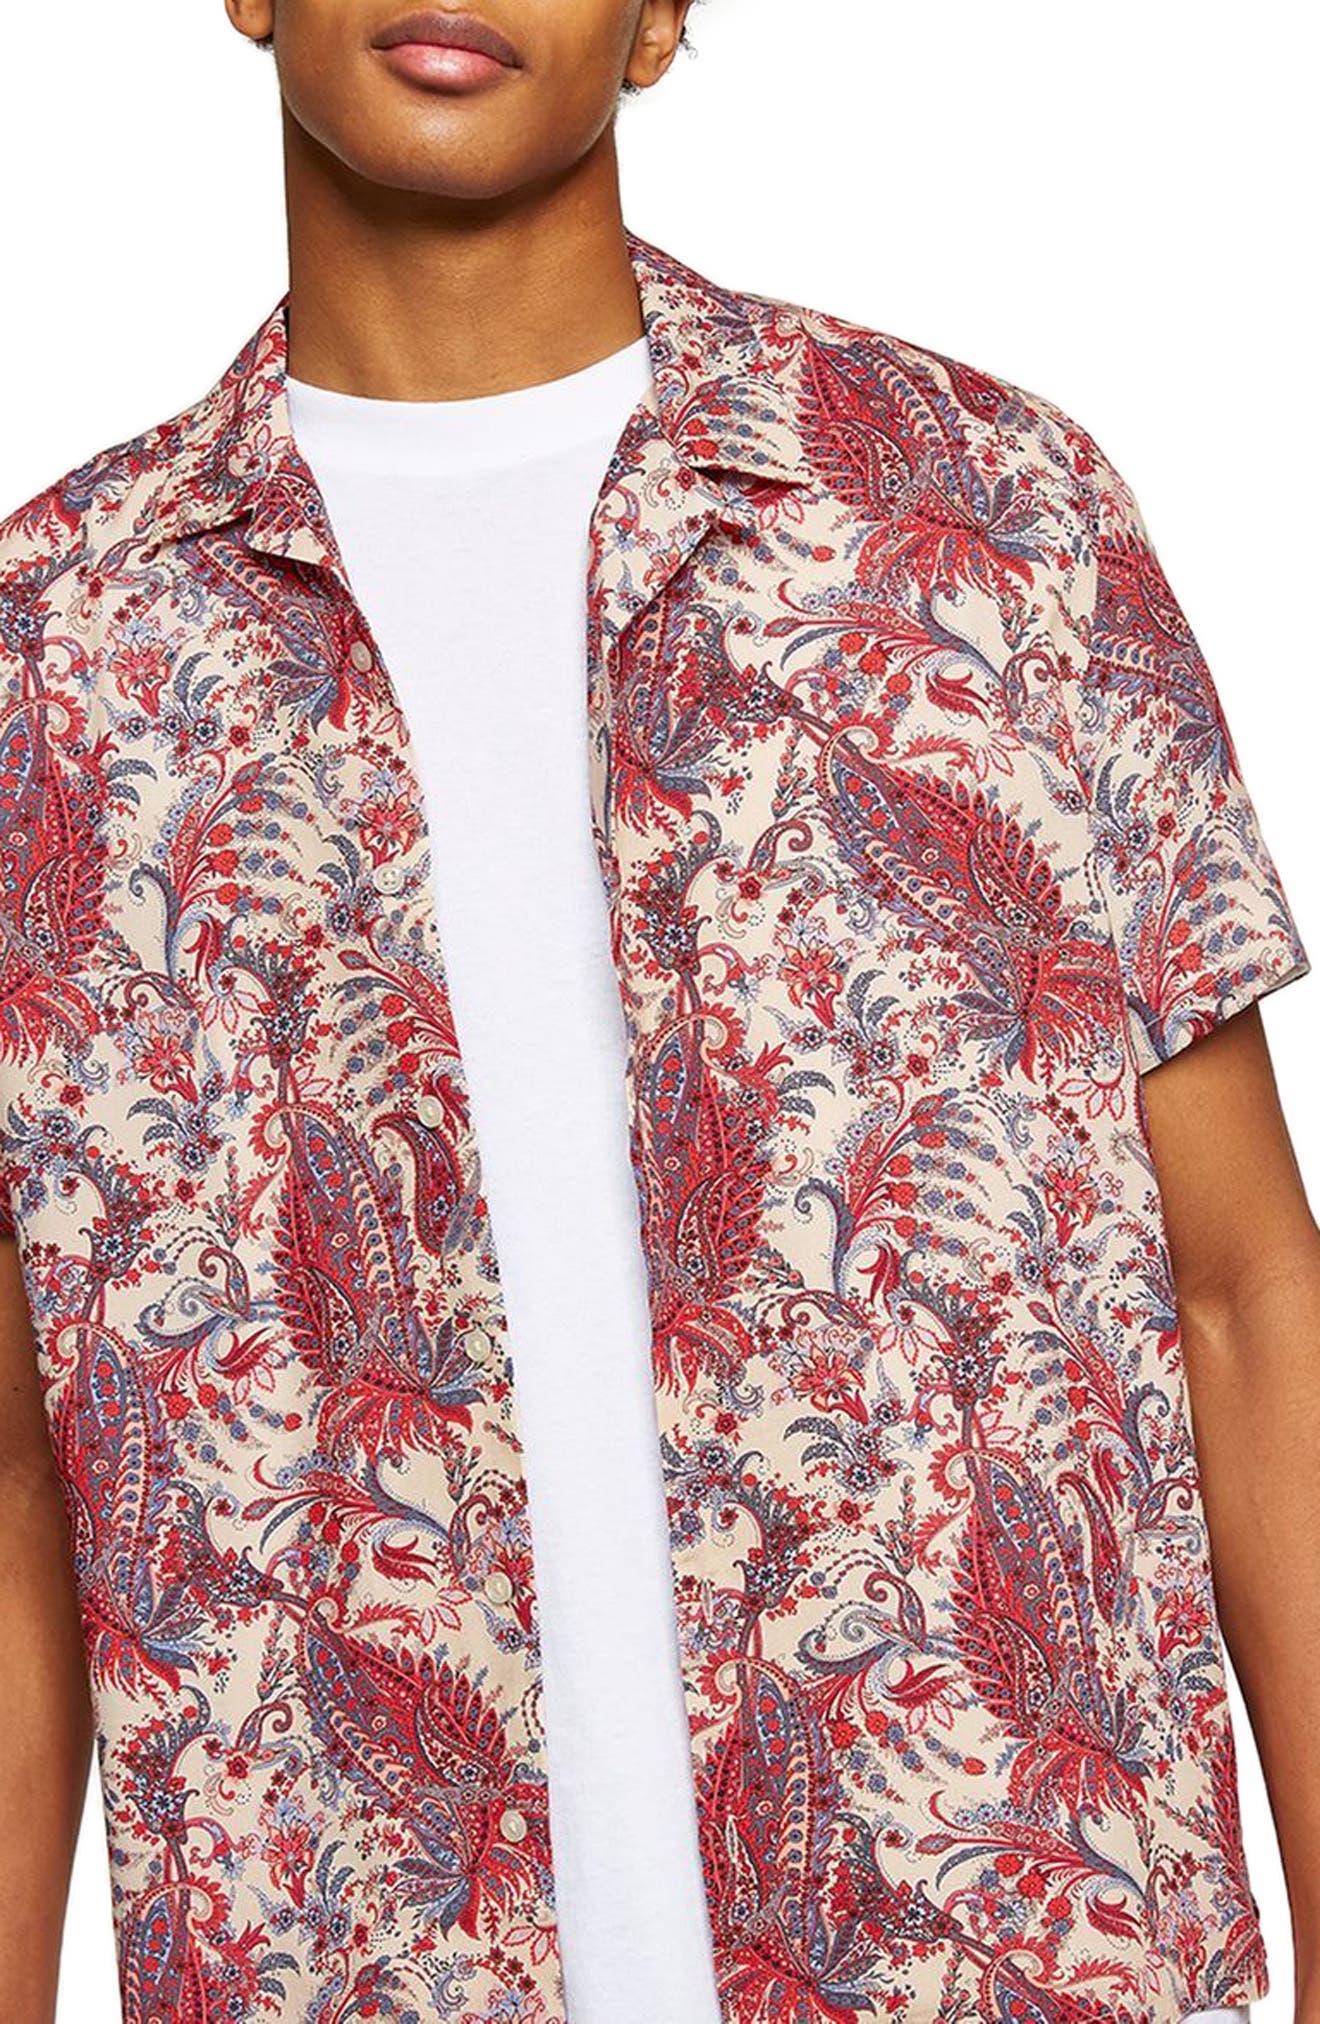 Alternate Image 1 Selected - Topman Paisley Camp Shirt